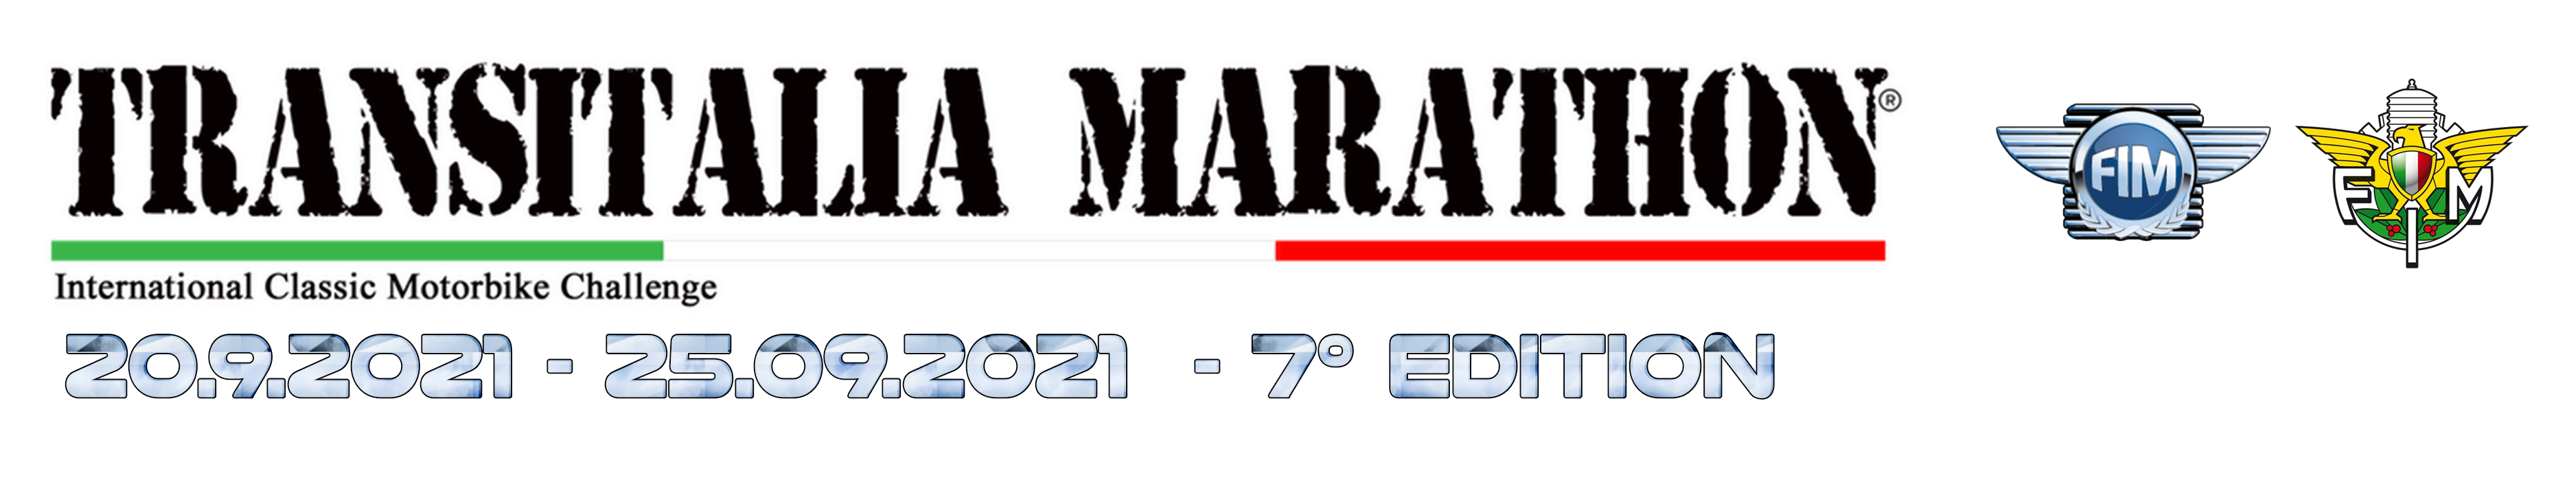 italiainpiega-evento-moto off road 2021-transitalia marathon